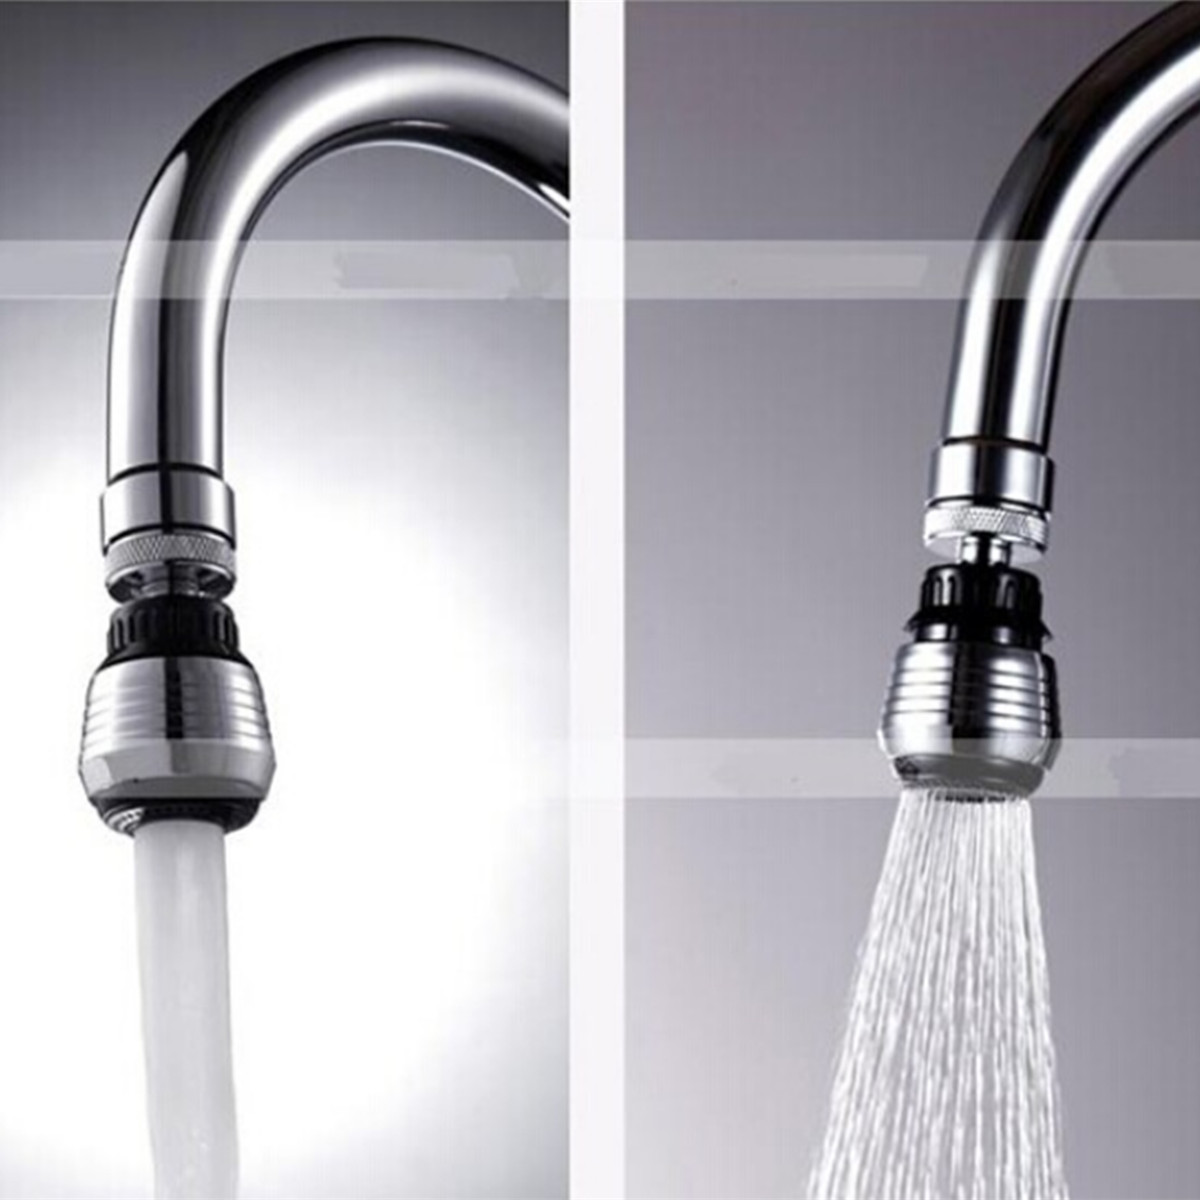 Water Saving Swivel Kitchen Bathroom Faucet Tap Adapter Aerator ...